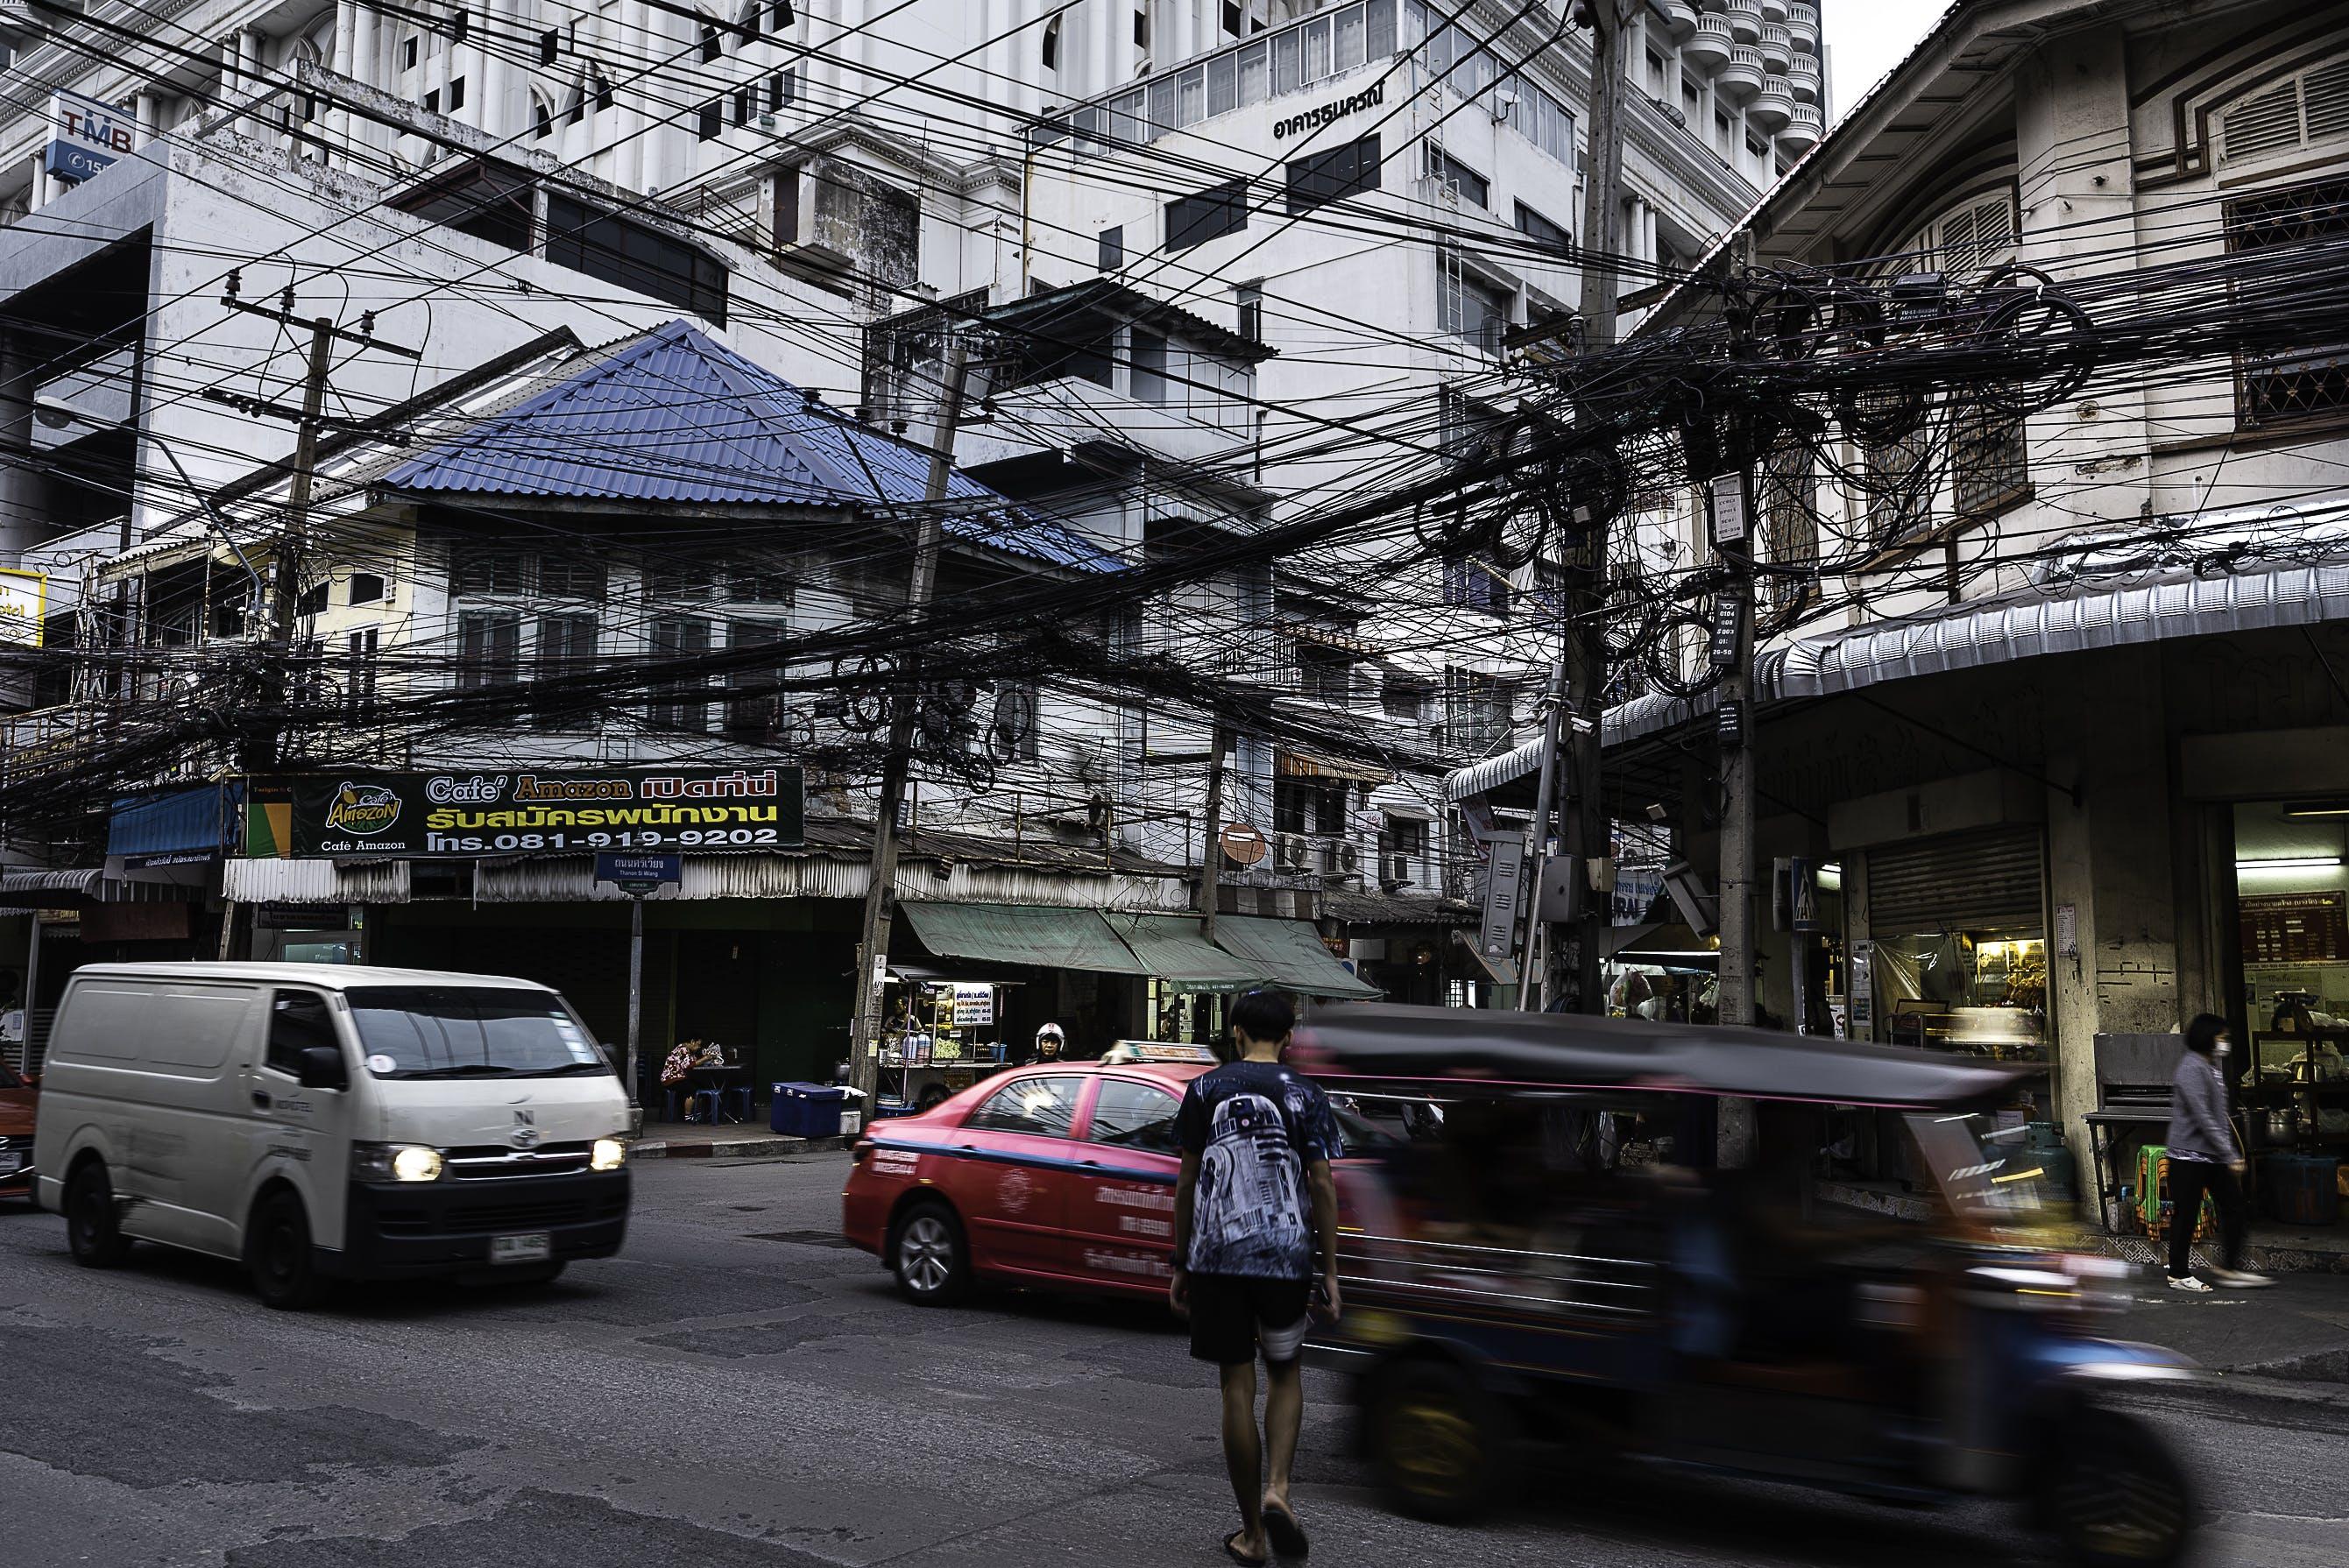 Free stock photo of Bangkok, street